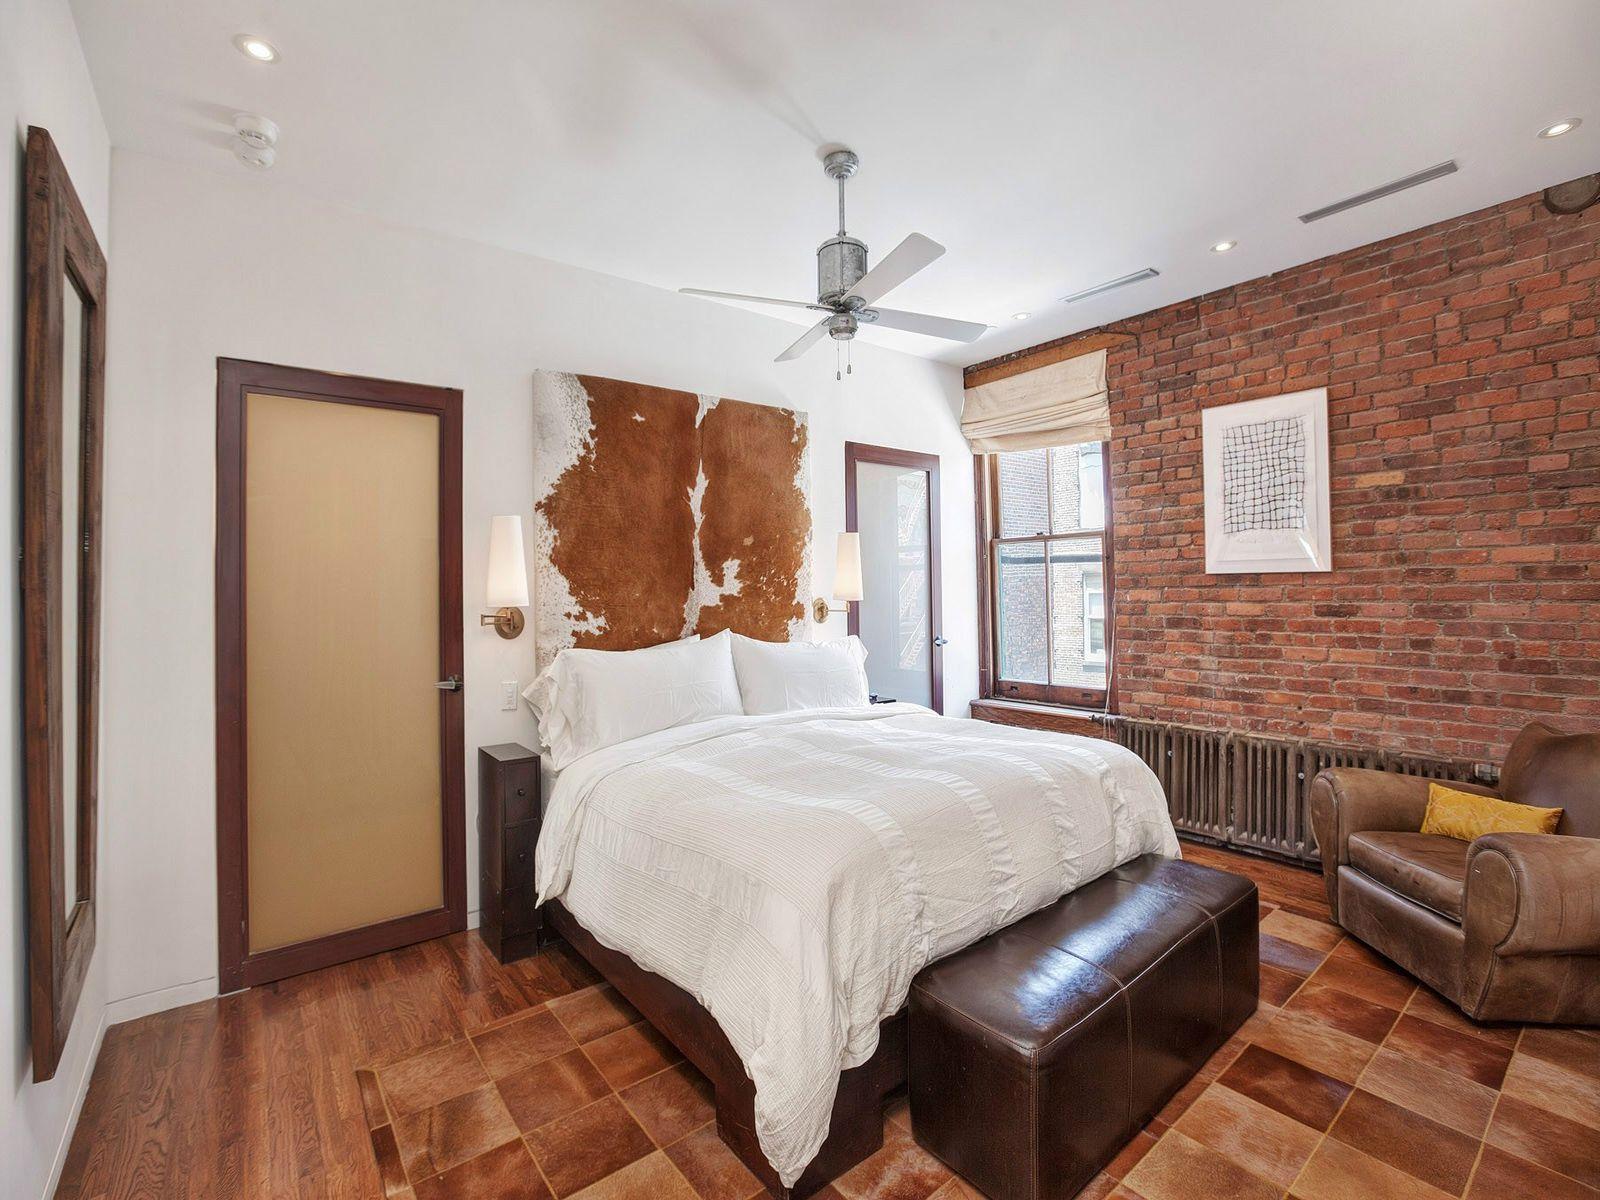 112 Prince Street, 5th Floor